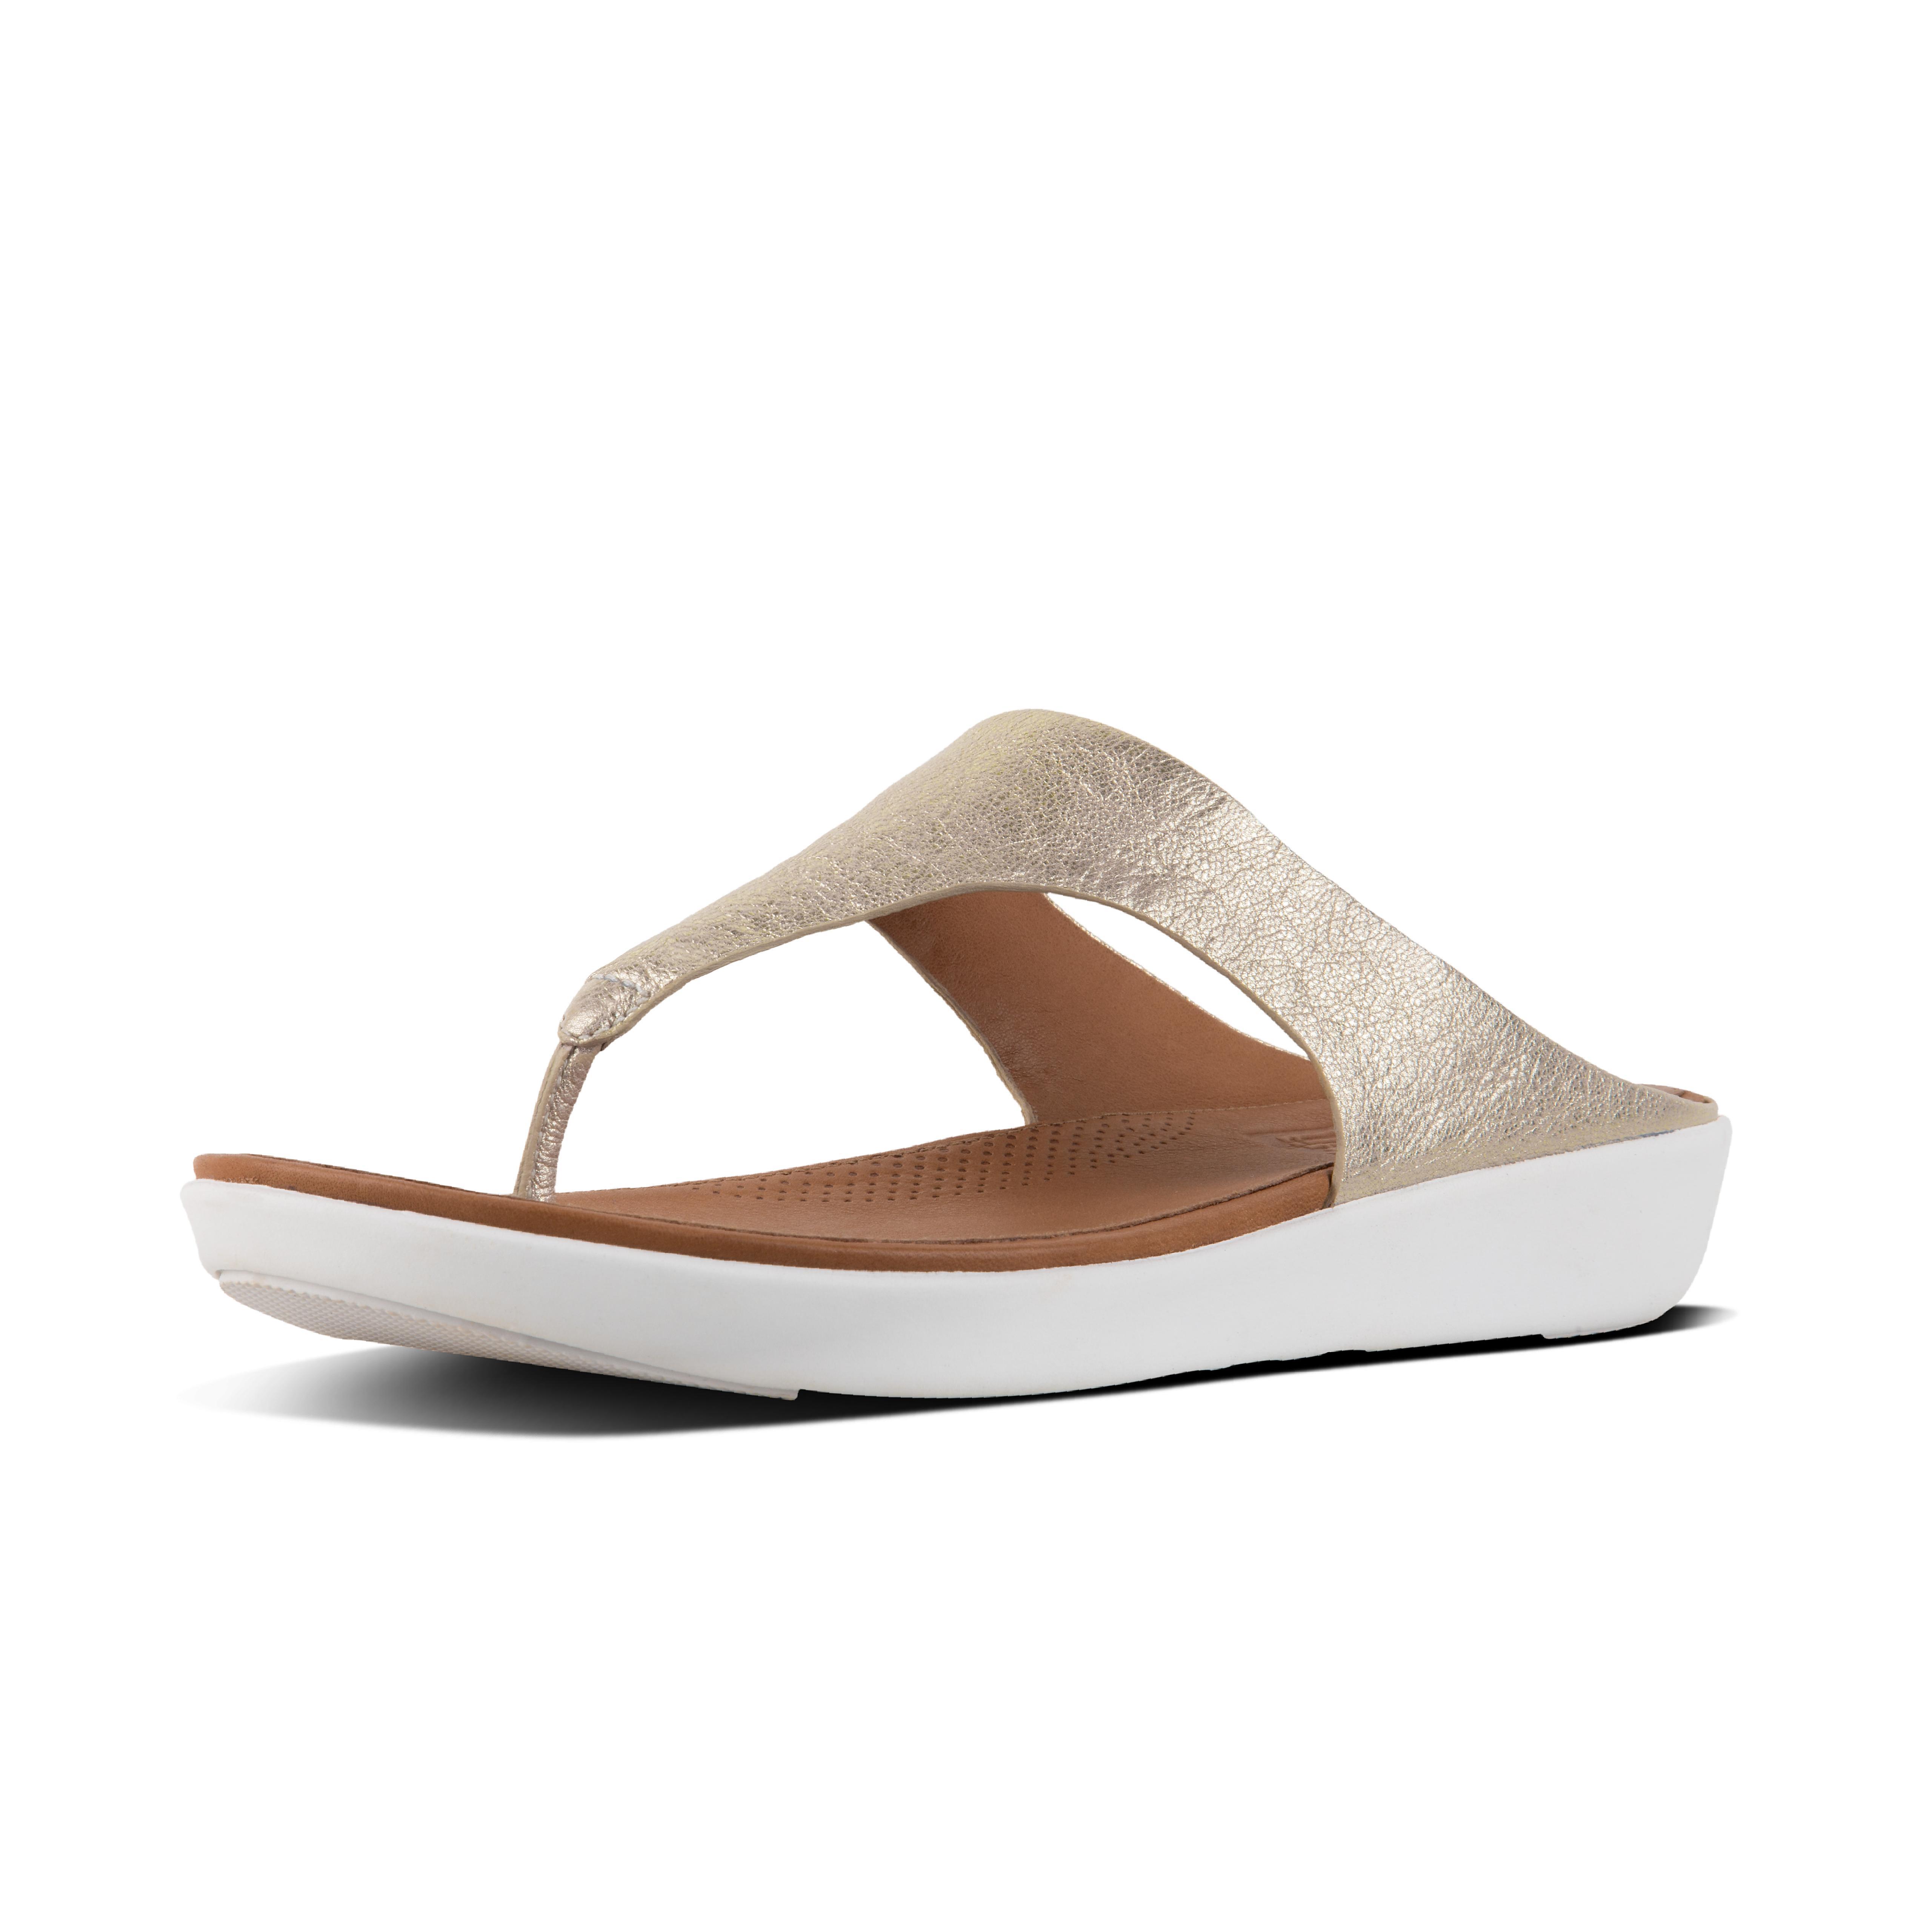 Banda ii toe thong sandals metallic leather metallic silver l17 527?v=3